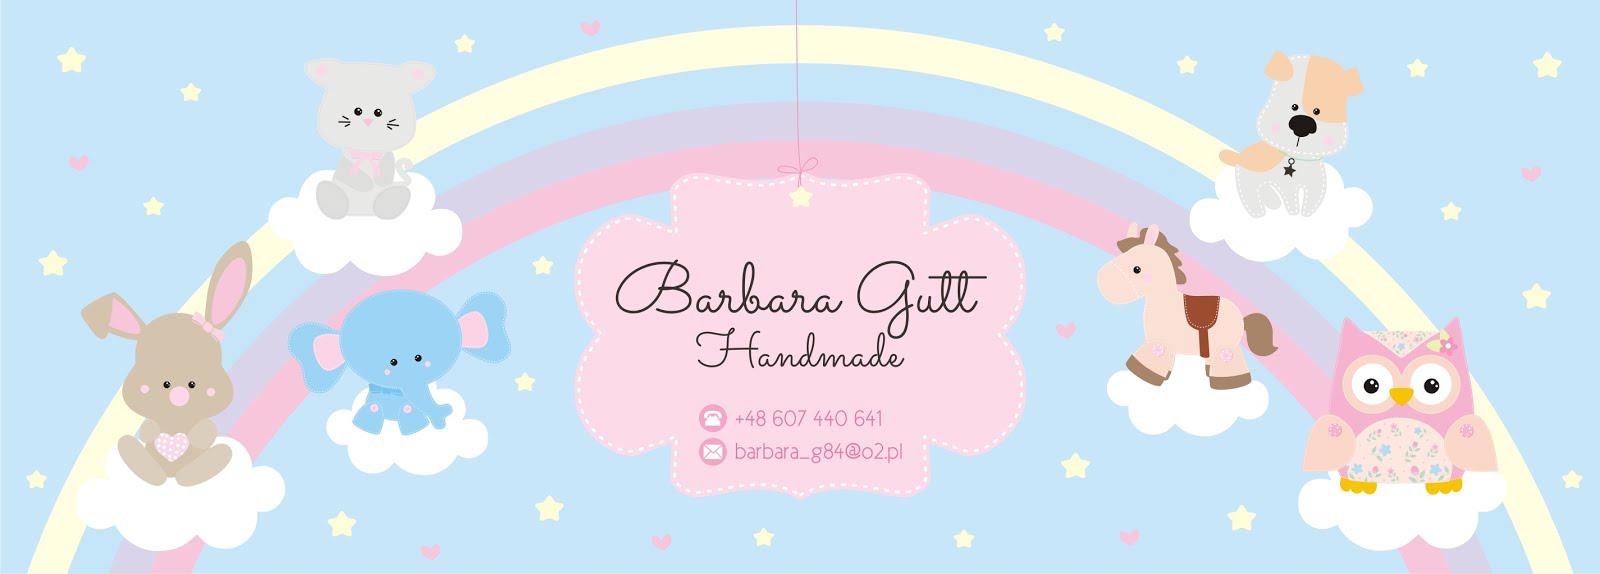 Barbara handmade